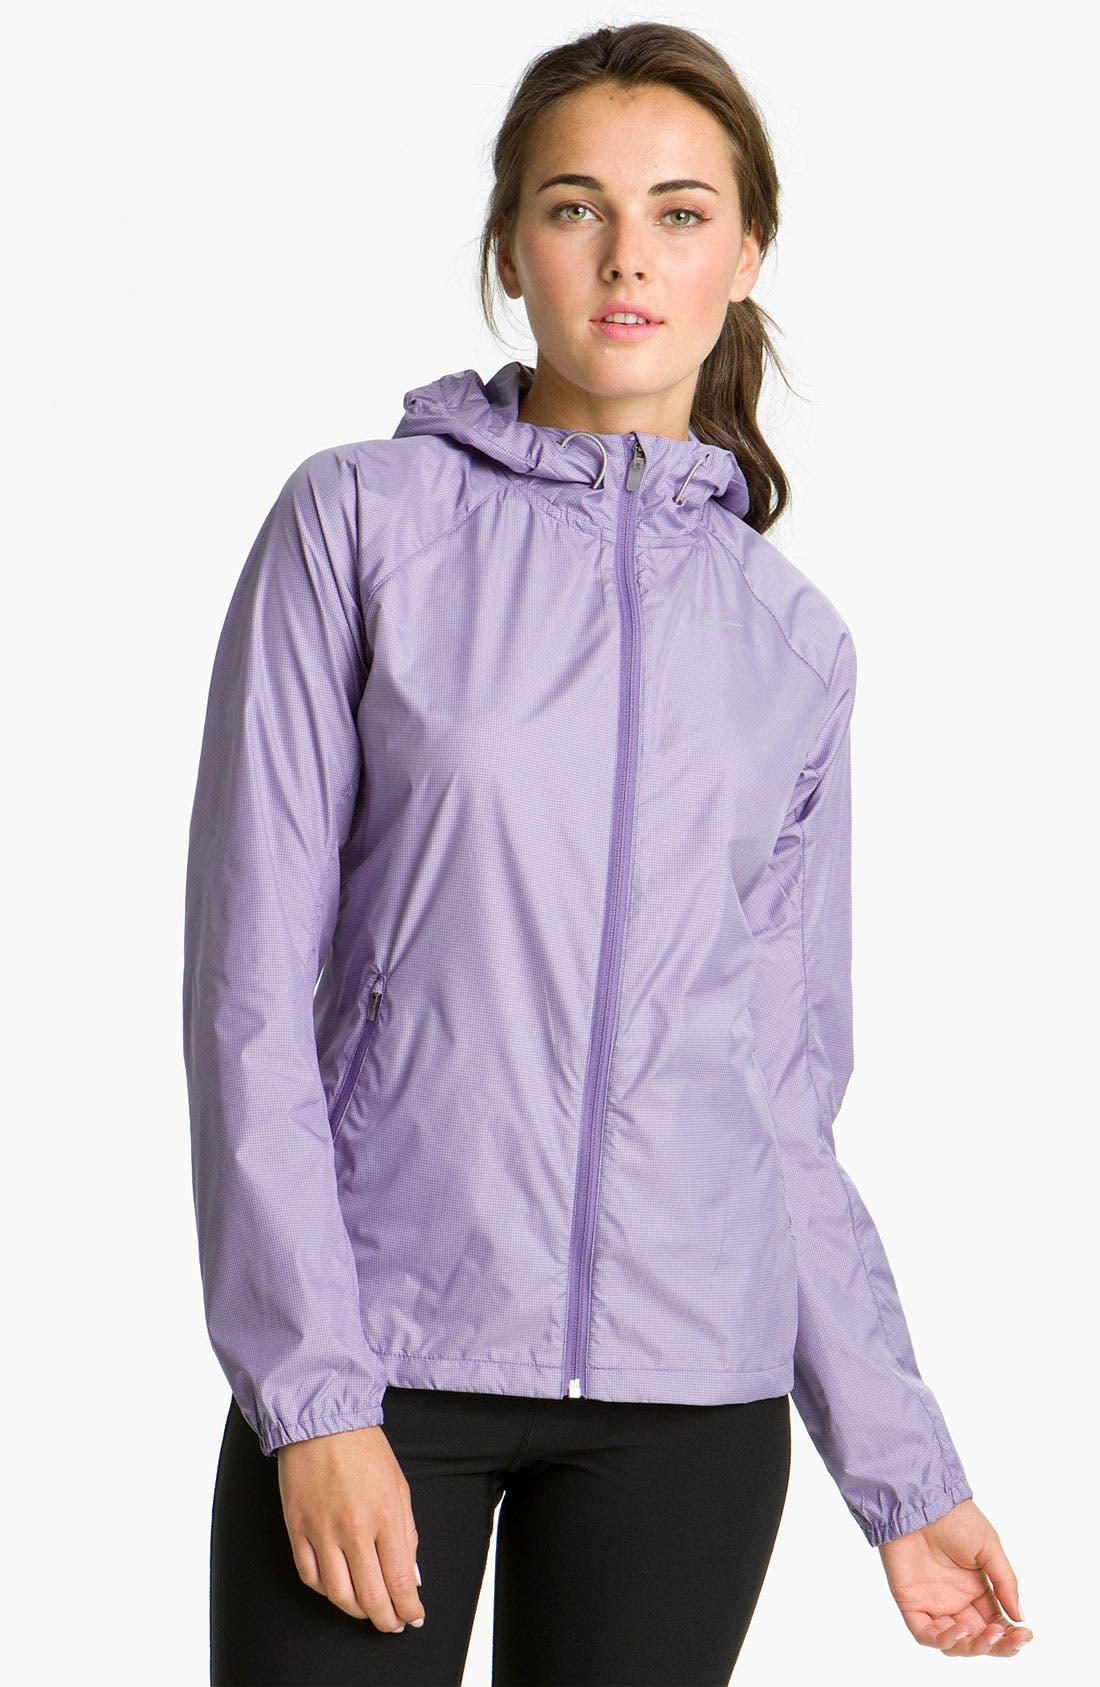 Alternate Image 1 Selected - Nike 'Vapor Lite' Hooded Jacket